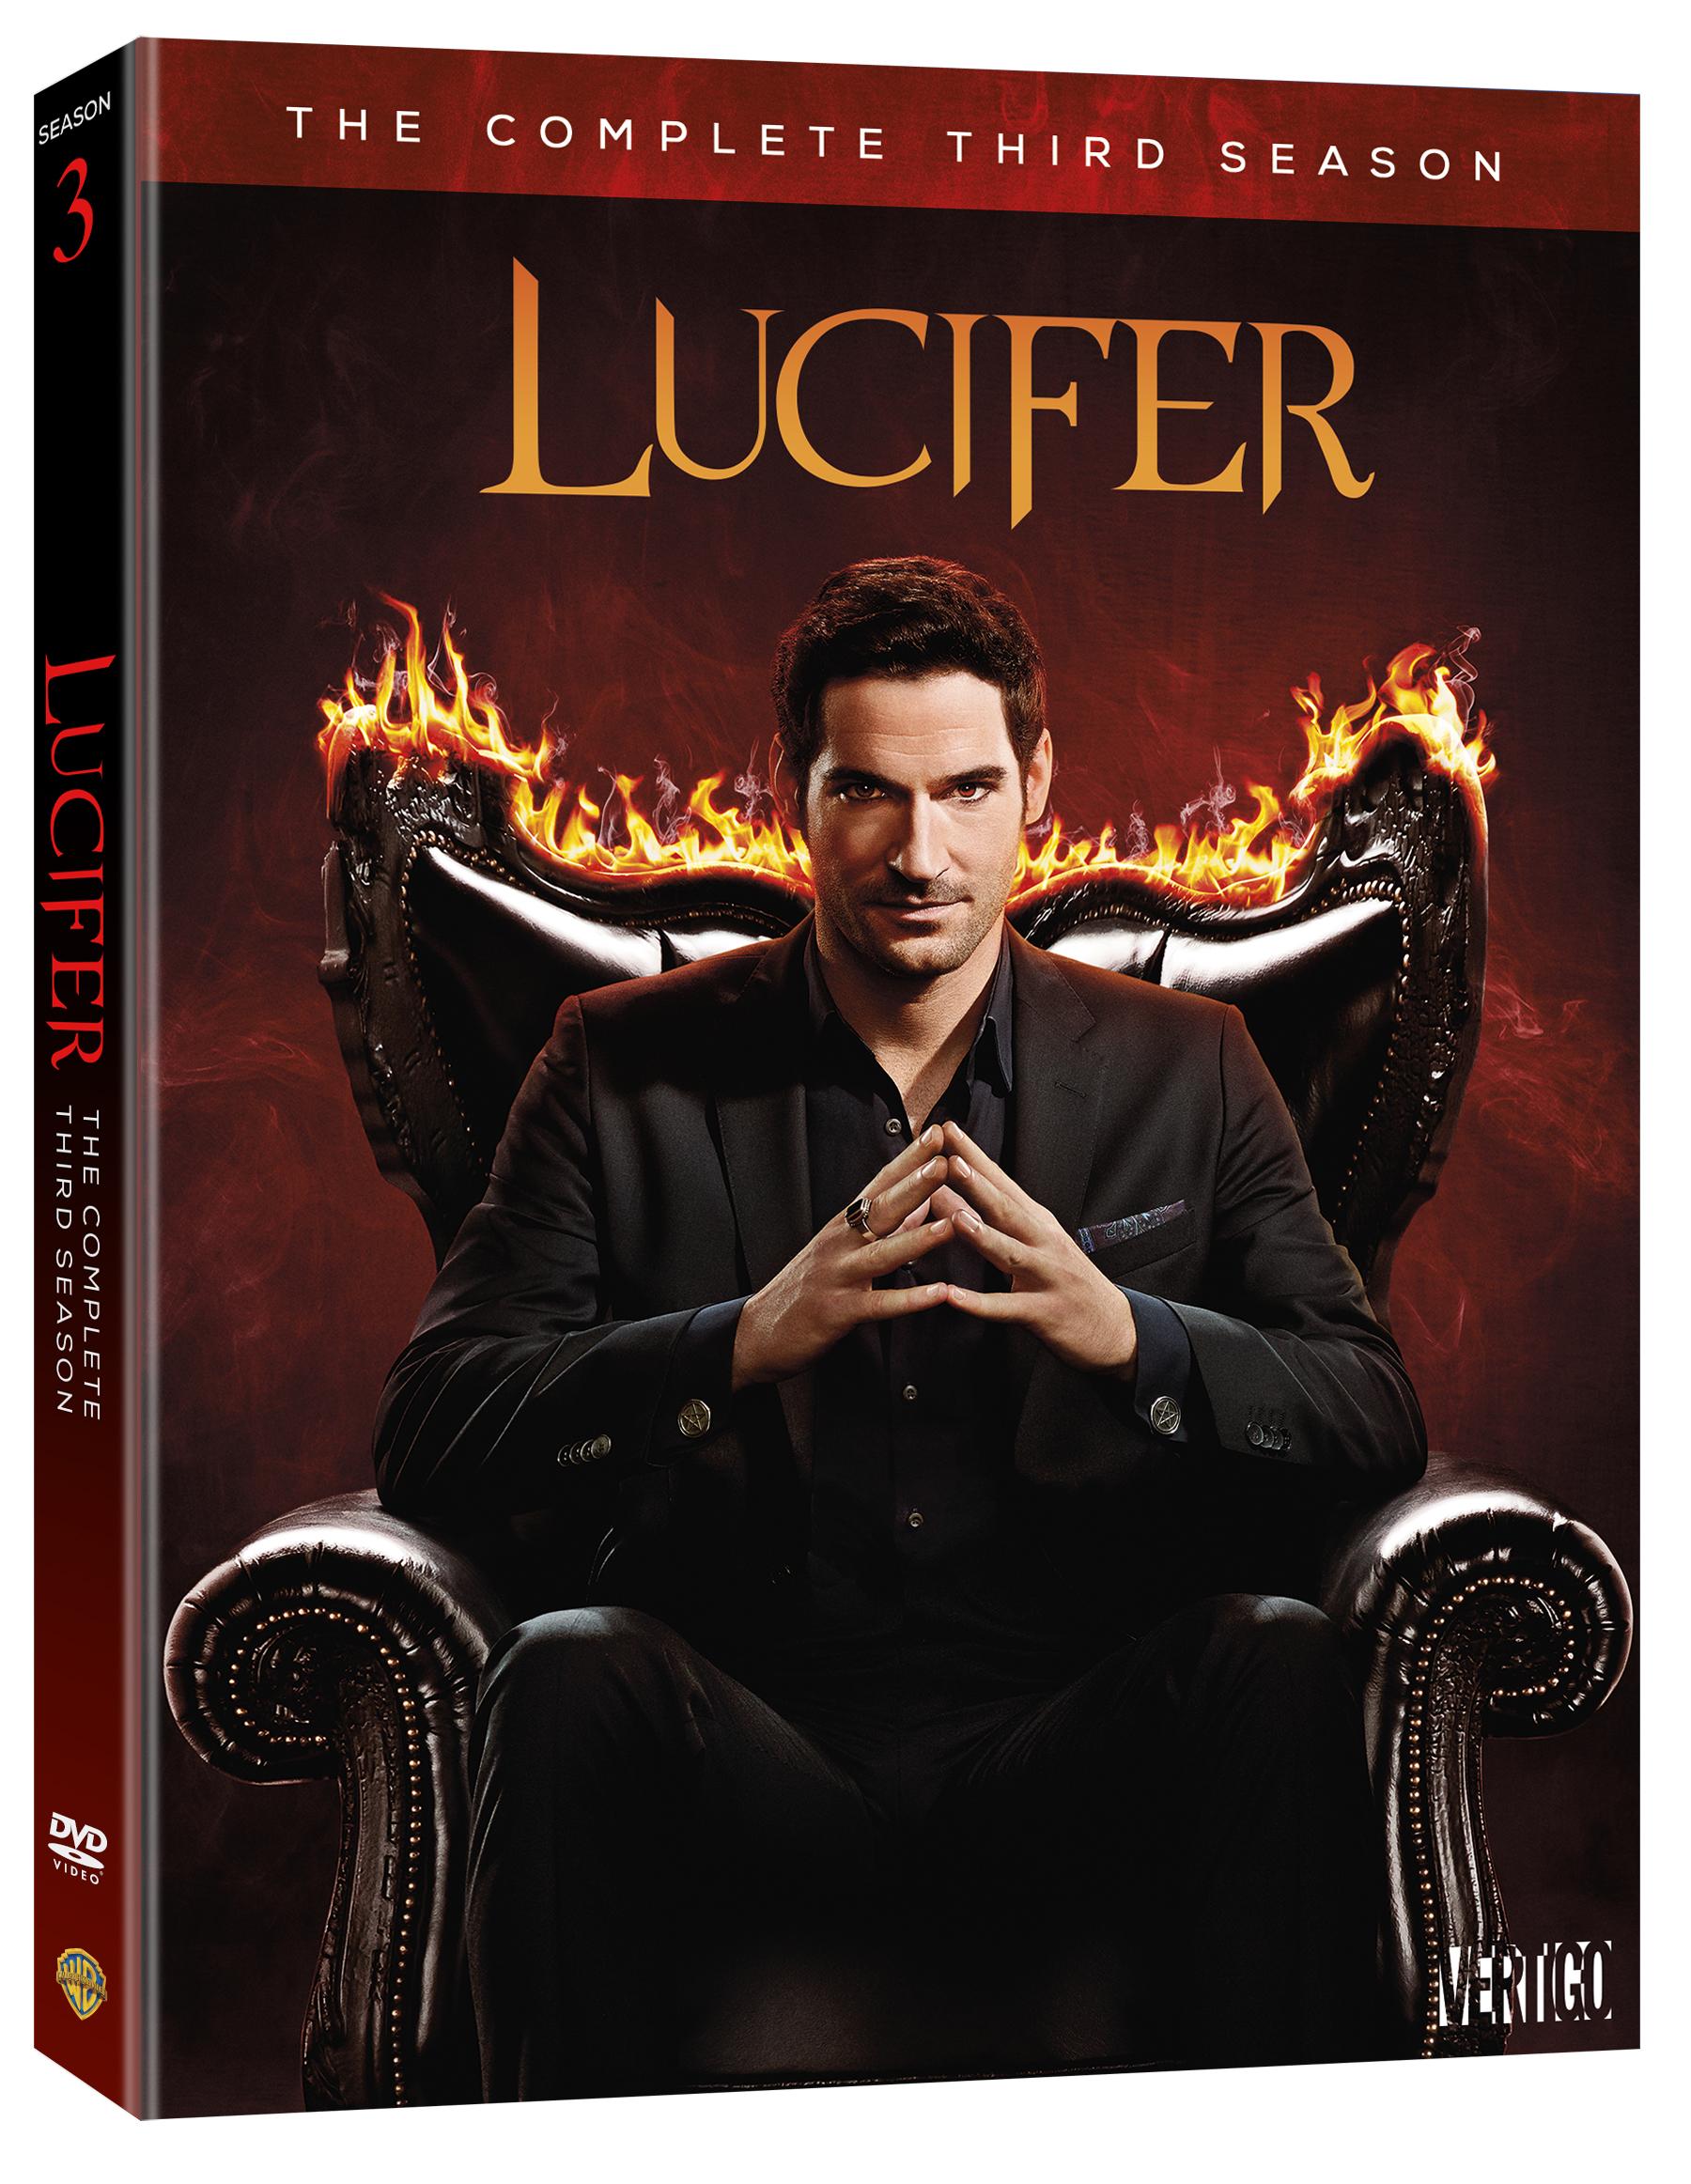 Modish Lucifer Season Dvd Details Revealed Ksitetv Lucifer Season 3 Episode 20 Openload Lucifer Season 3 Episode 20 Full Online houzz-03 Lucifer Season 3 Episode 20